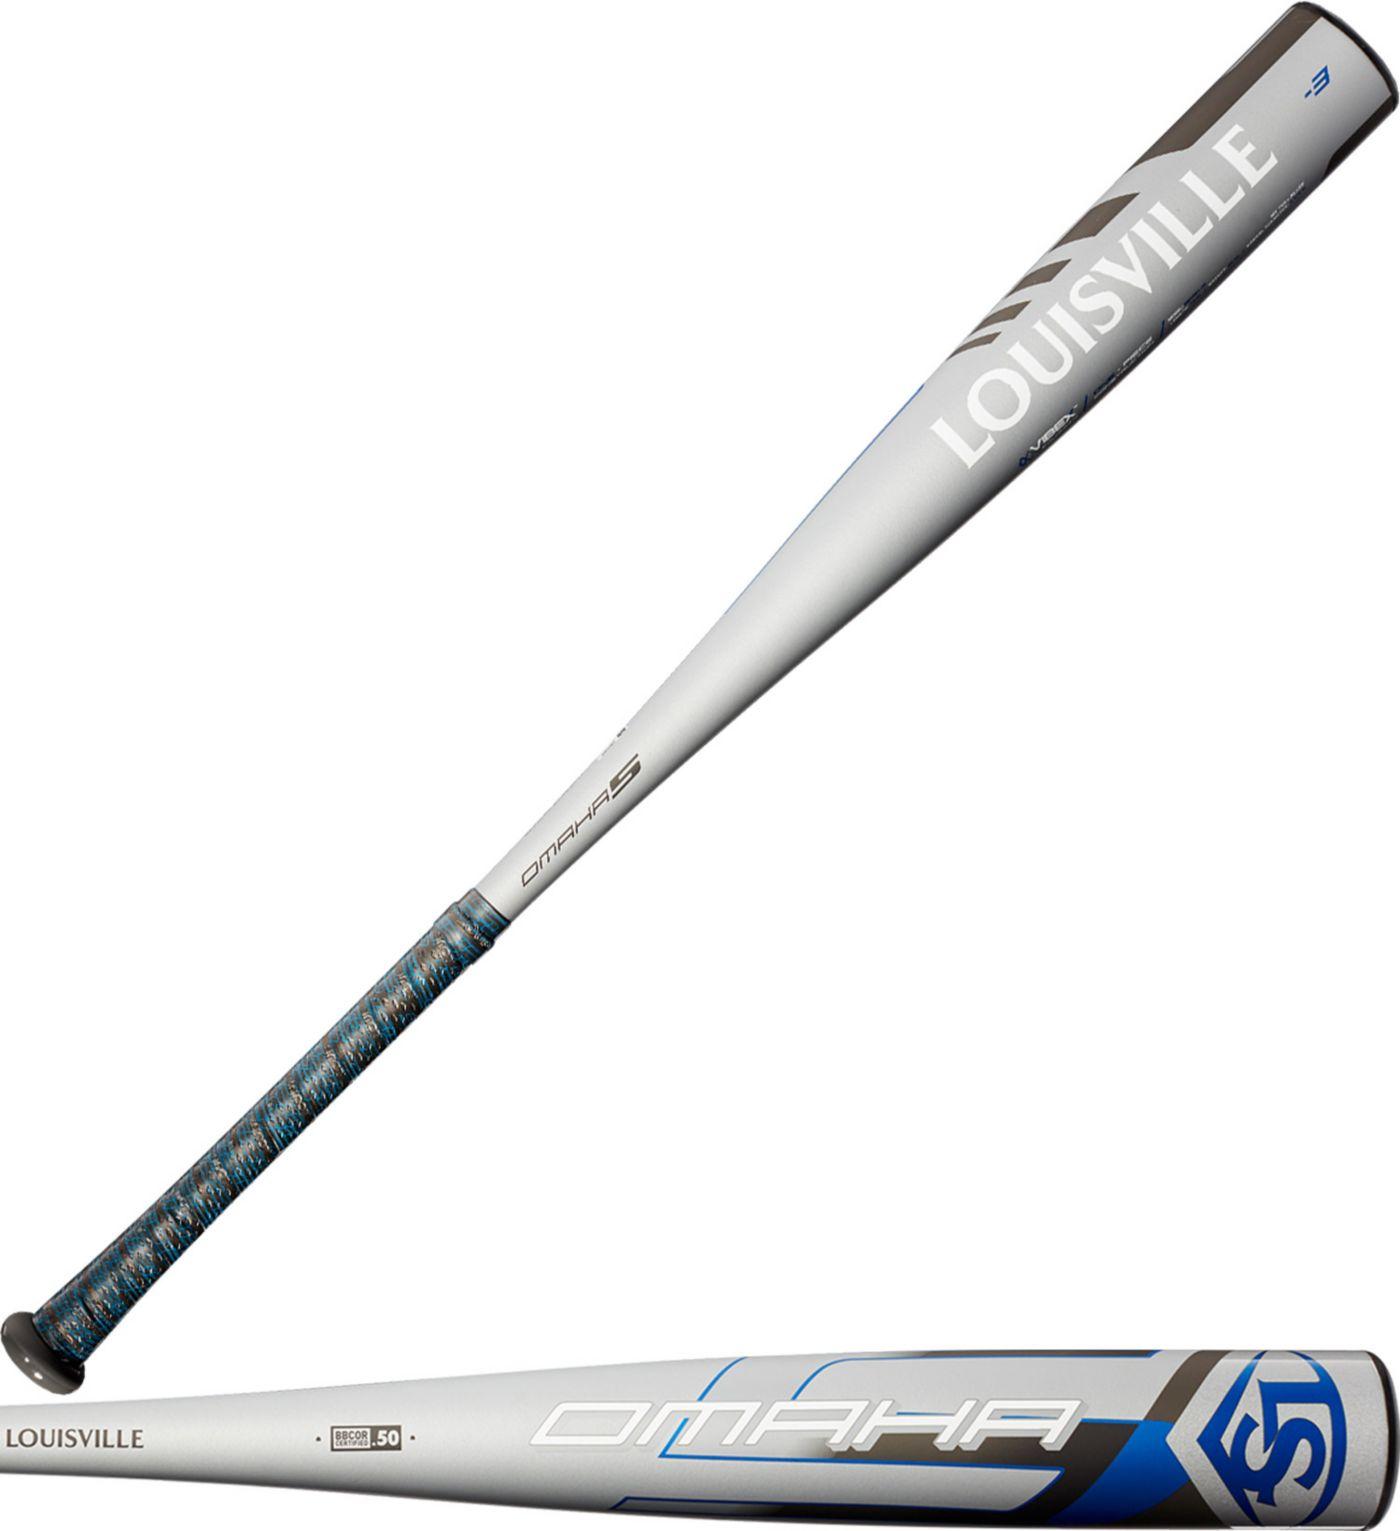 Louisville Slugger Omaha BBCOR Bat 2020 (-3)